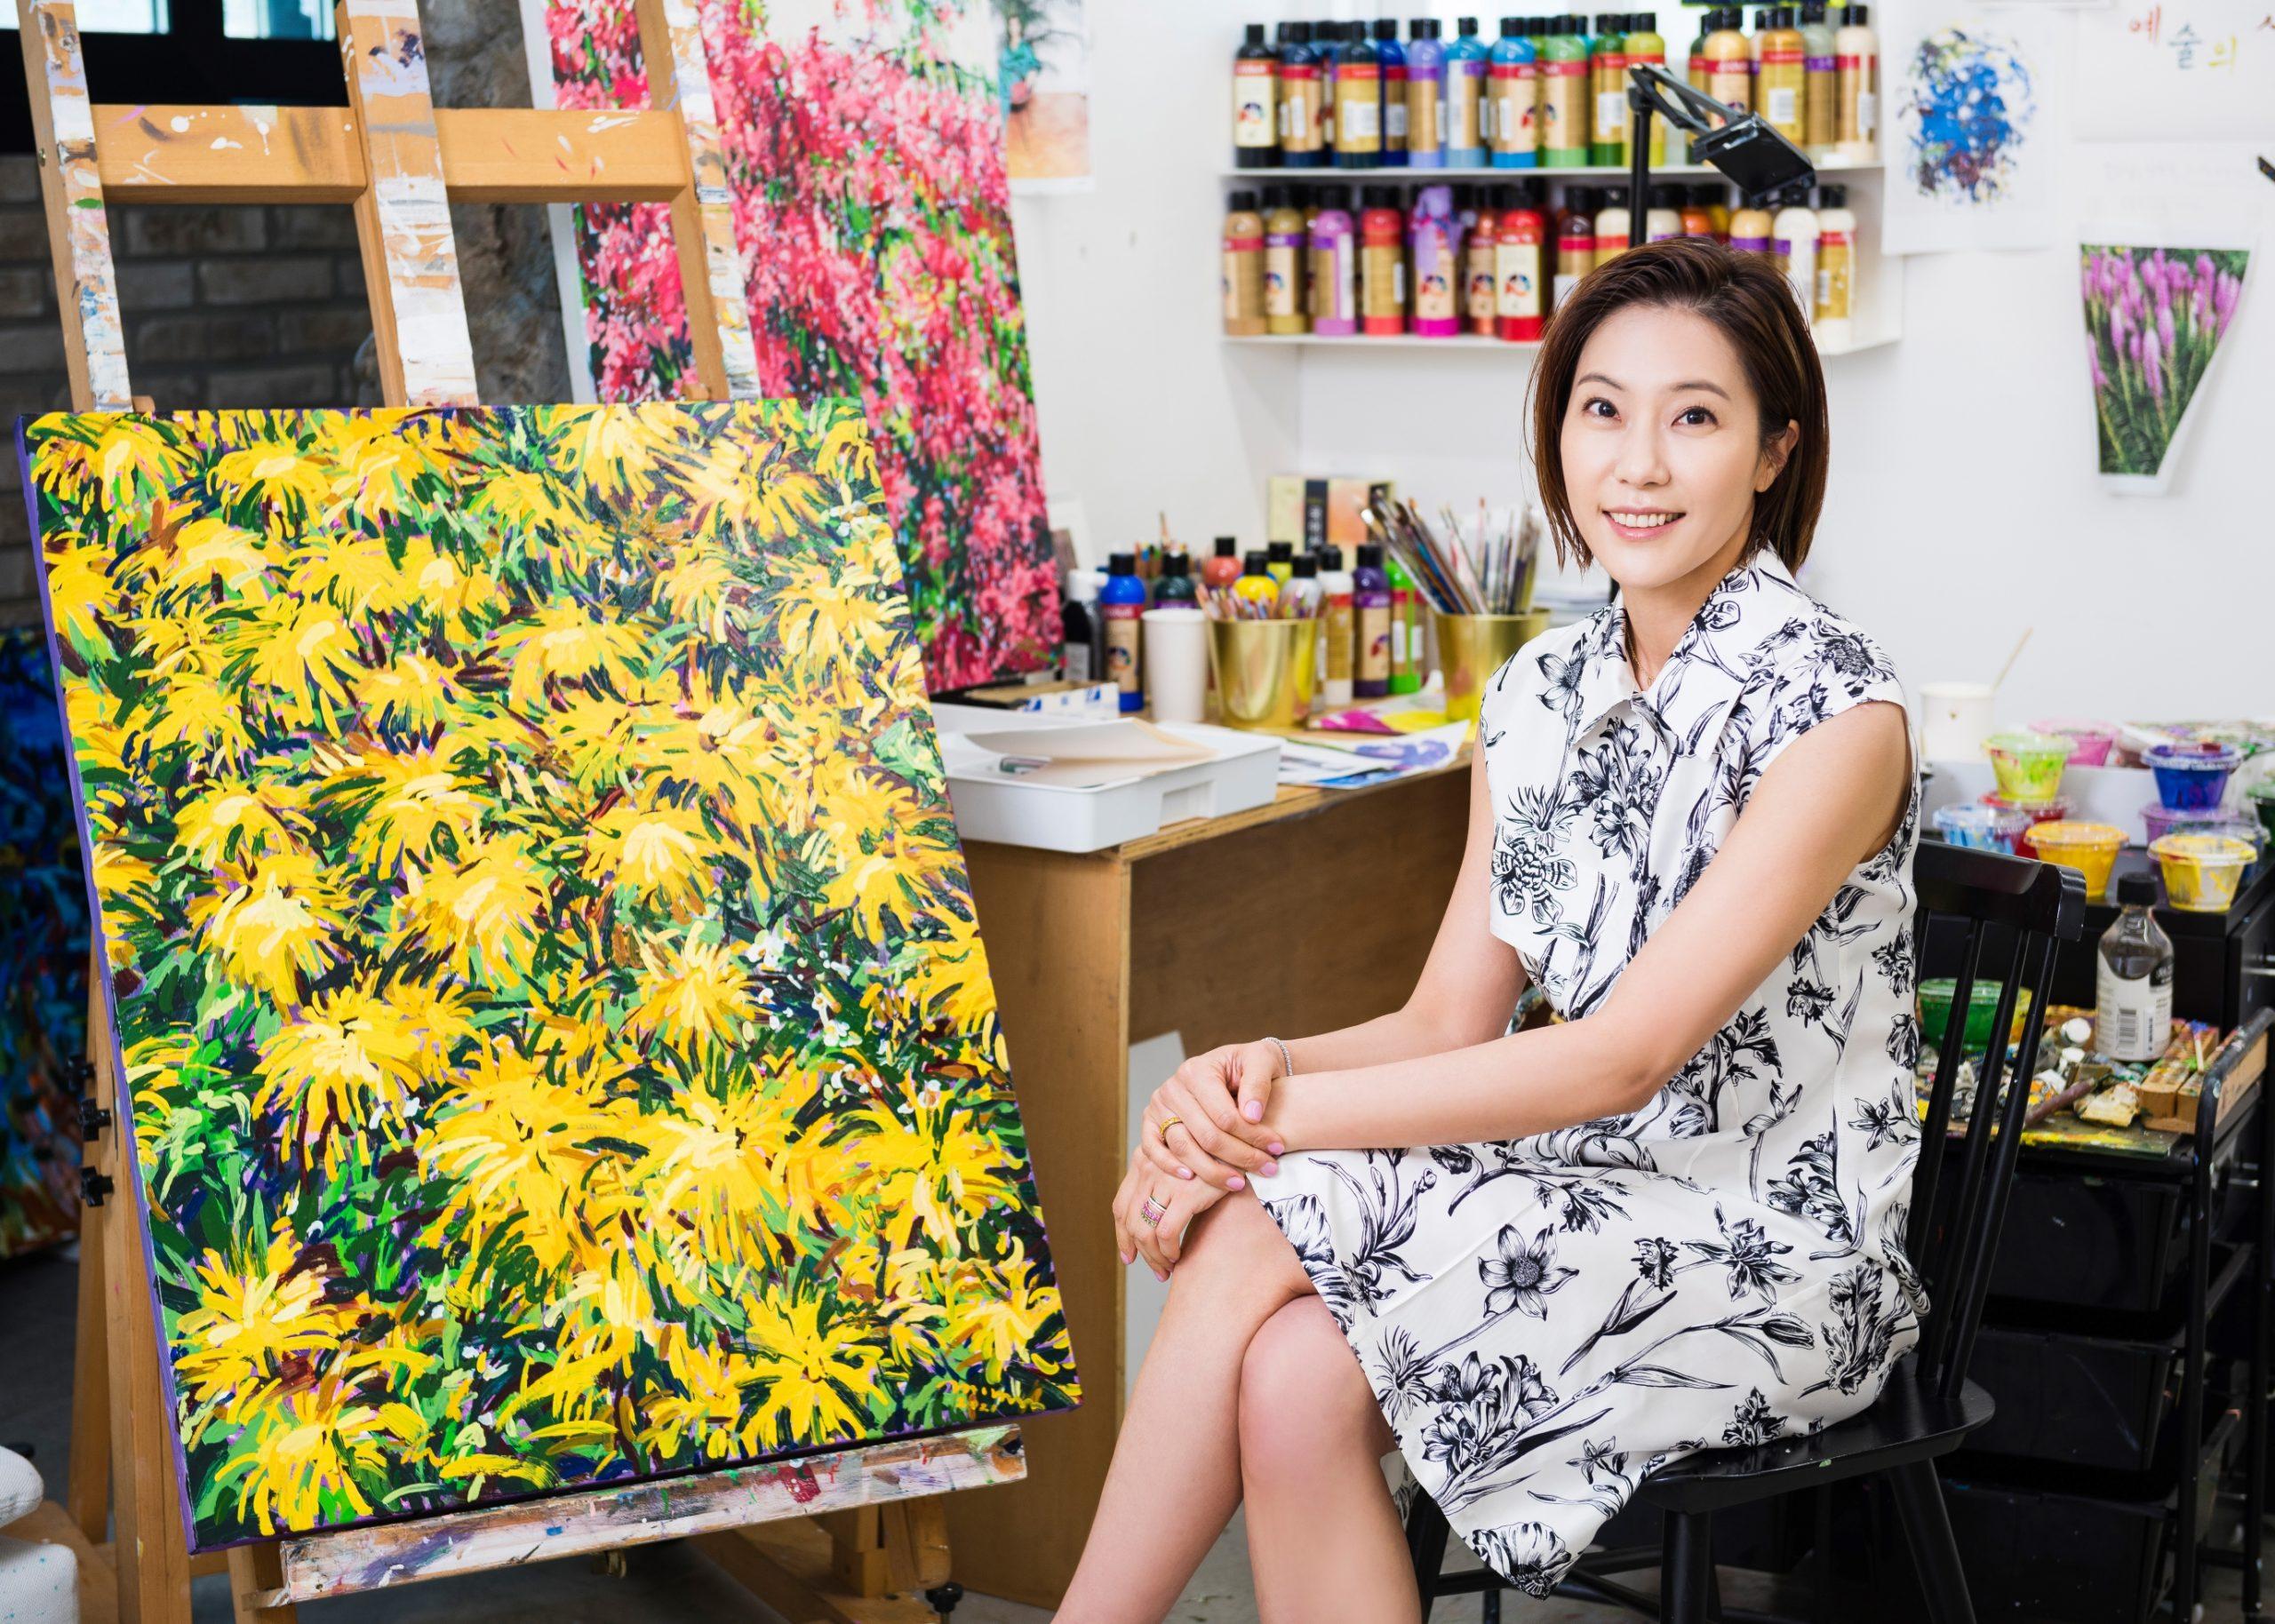 Hur Boree photographed in her studio